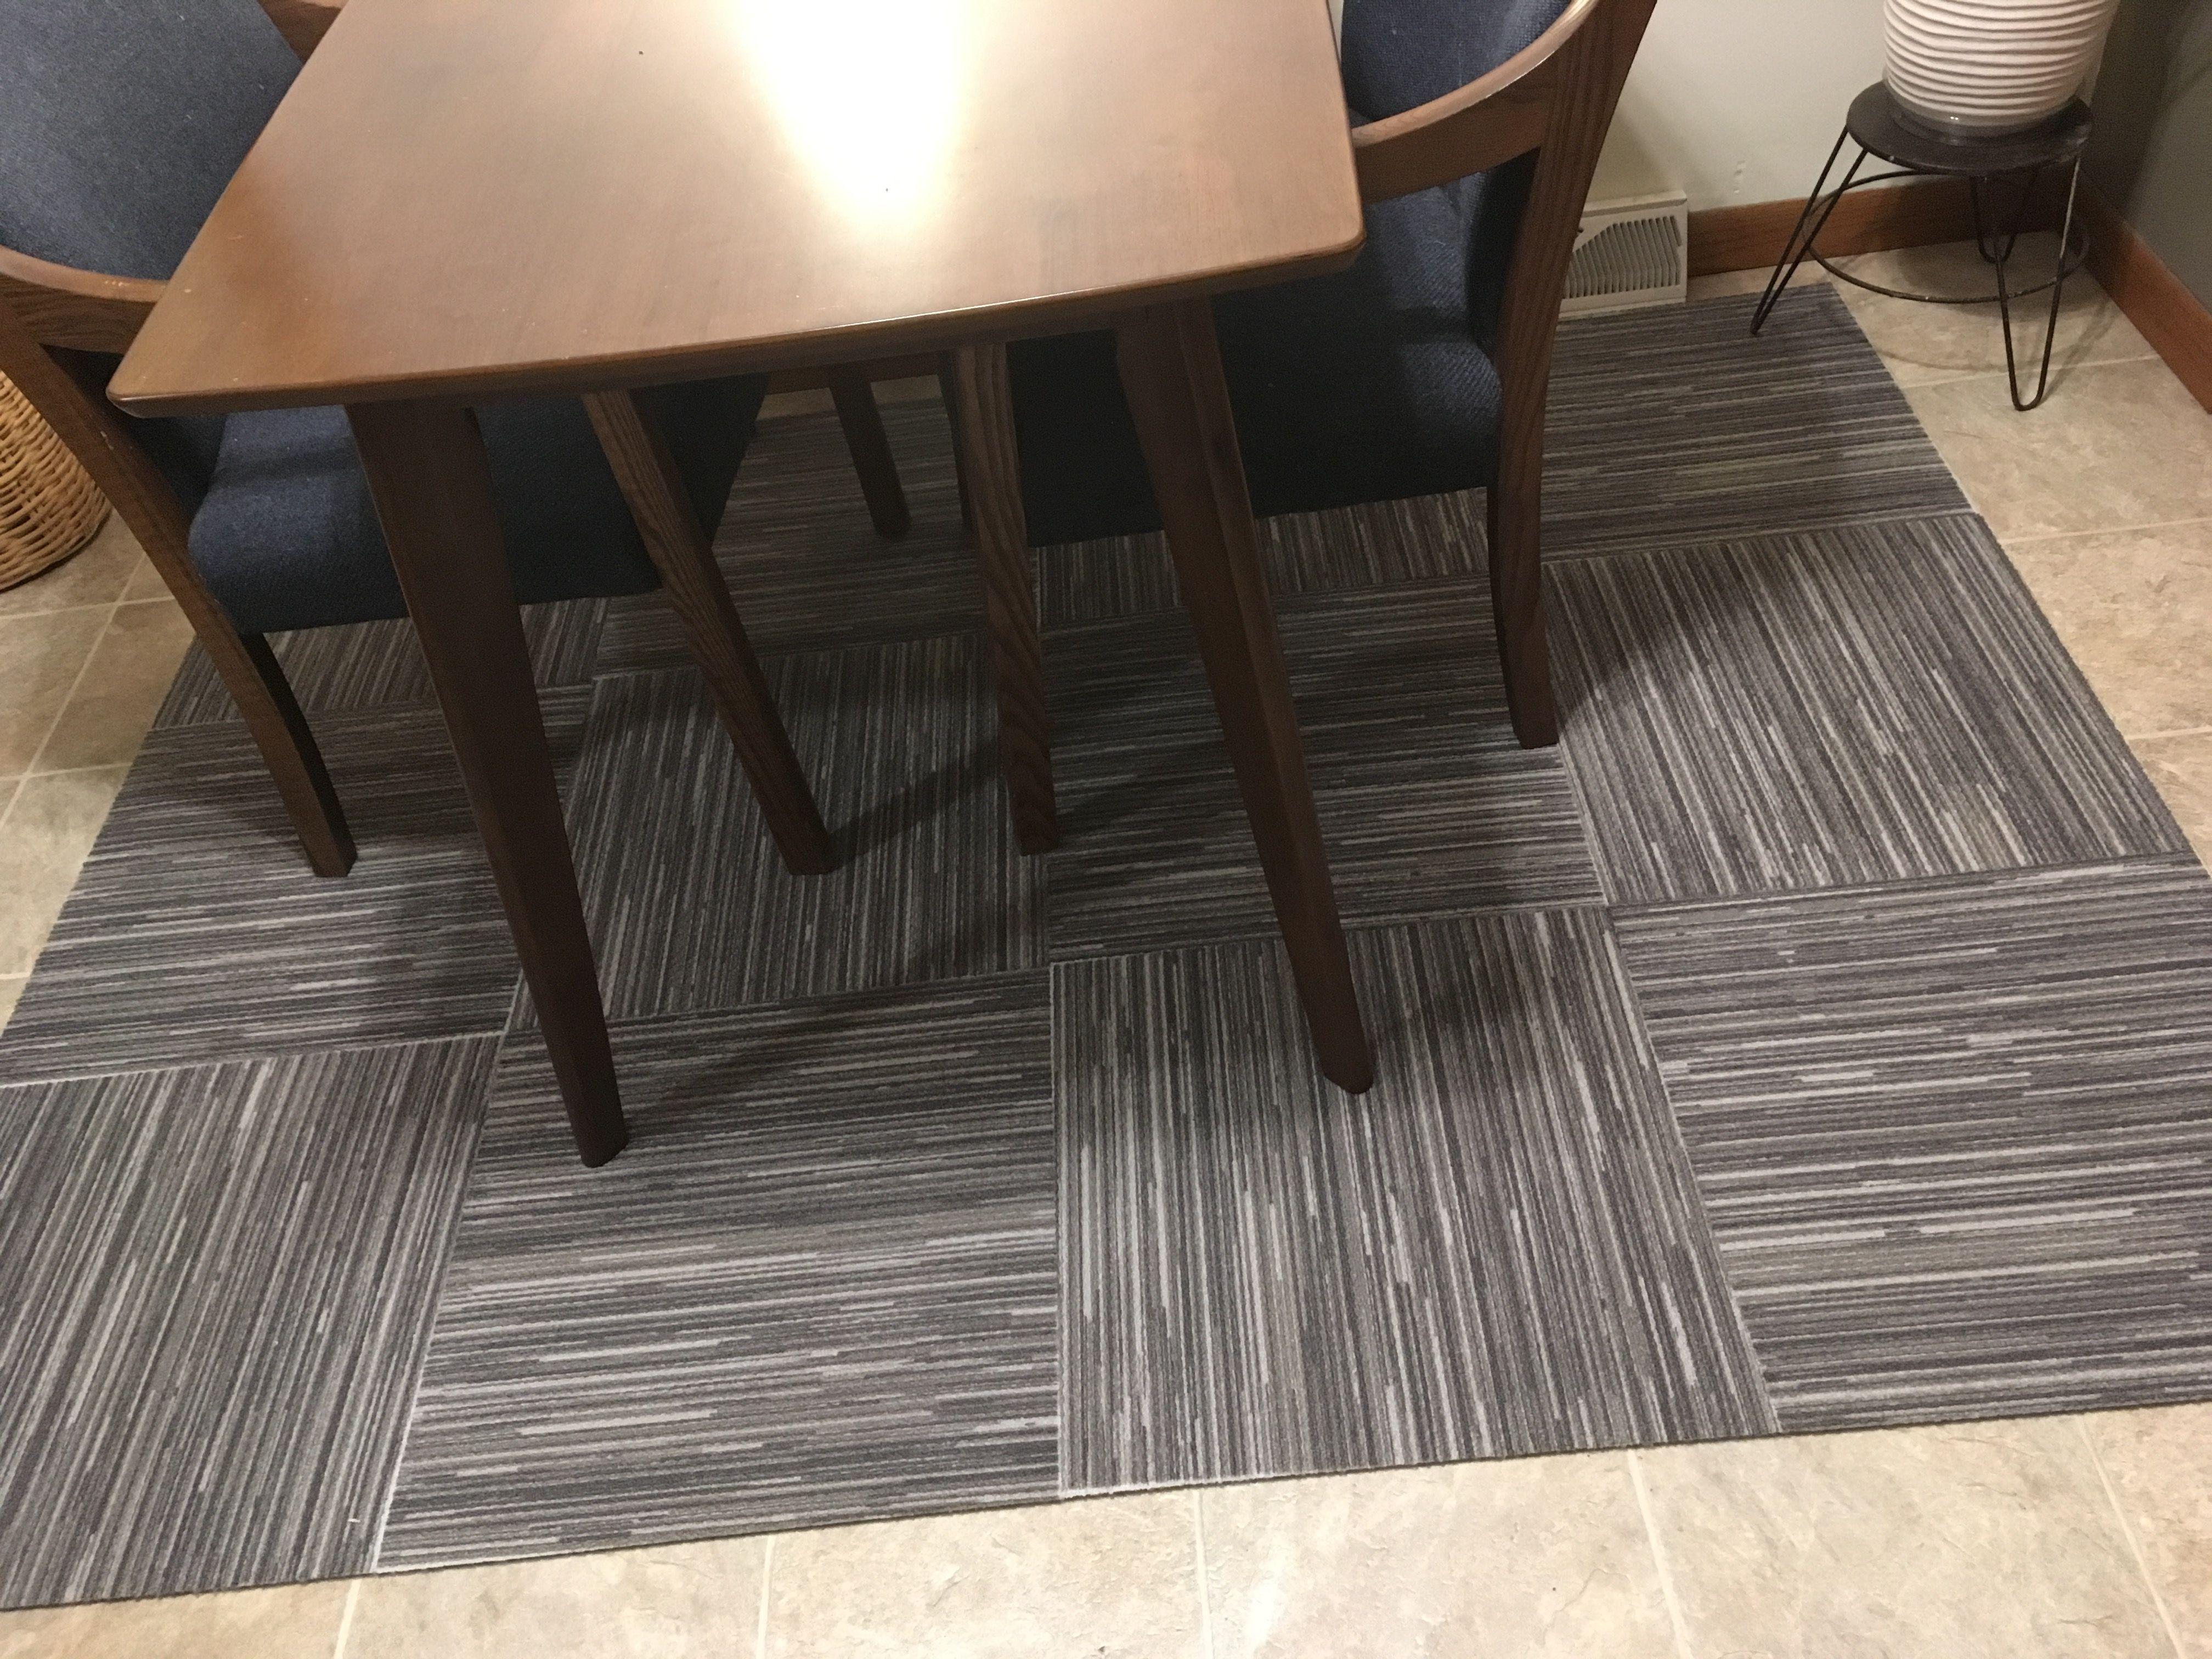 Carpet tiles for 1.29 Carpet tiles, Tiles, Home diy